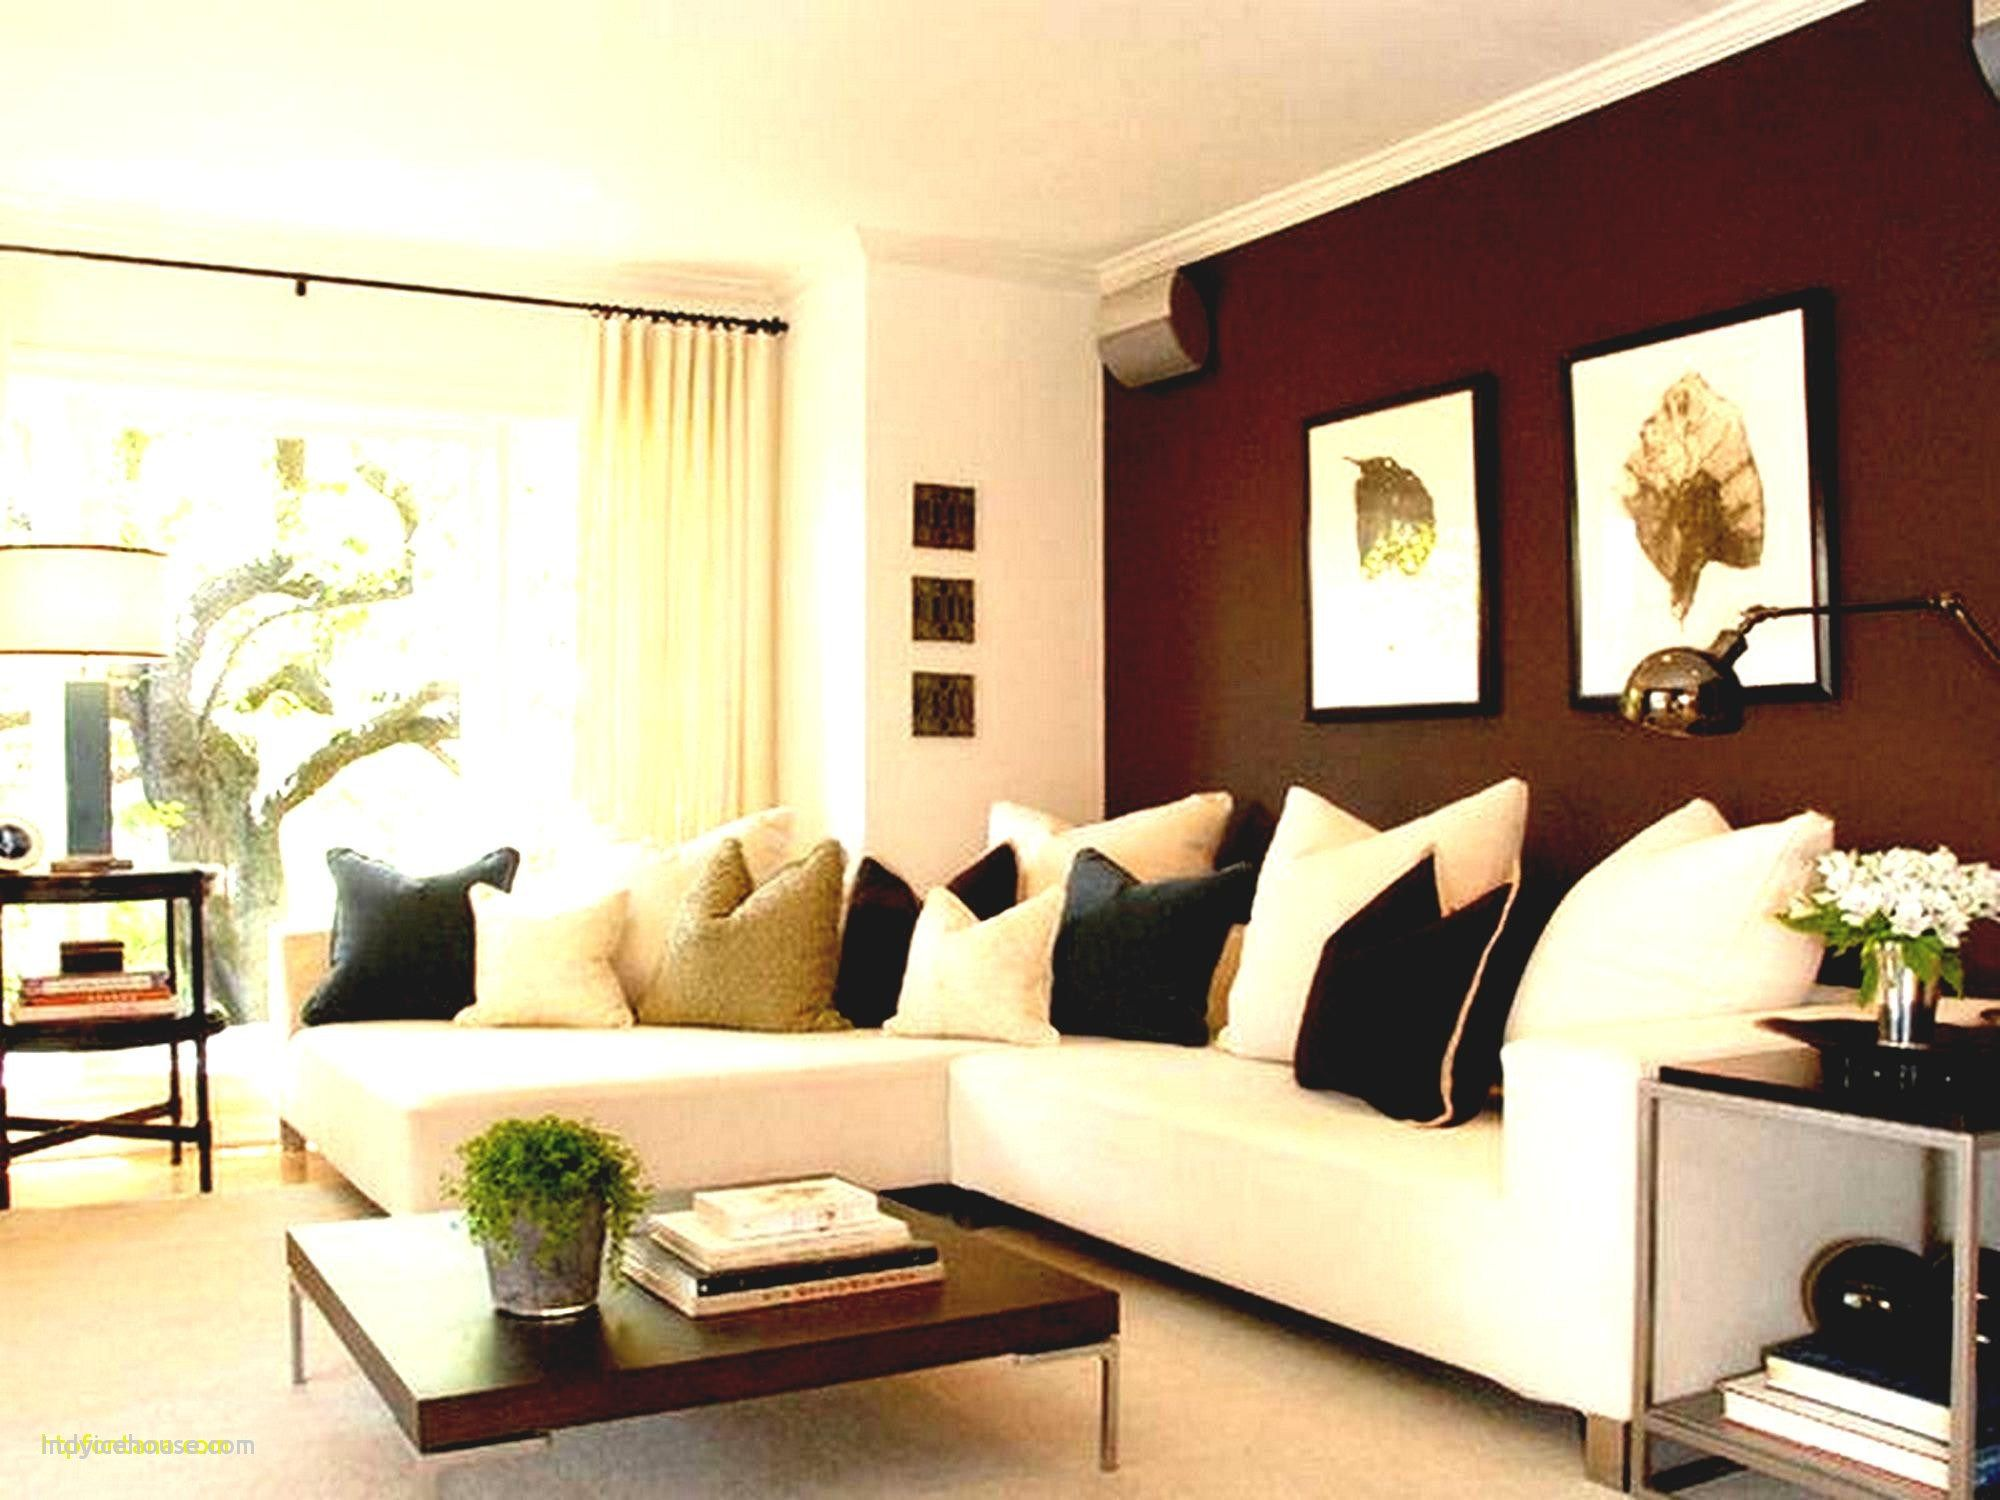 Bedroom Wall Colors For Light Brown Furniture Fresh Home Bedroom Paint Colors 2017 New 30 Luxury Best Color For Interior Desain Interior Ide Ruang Keluarga